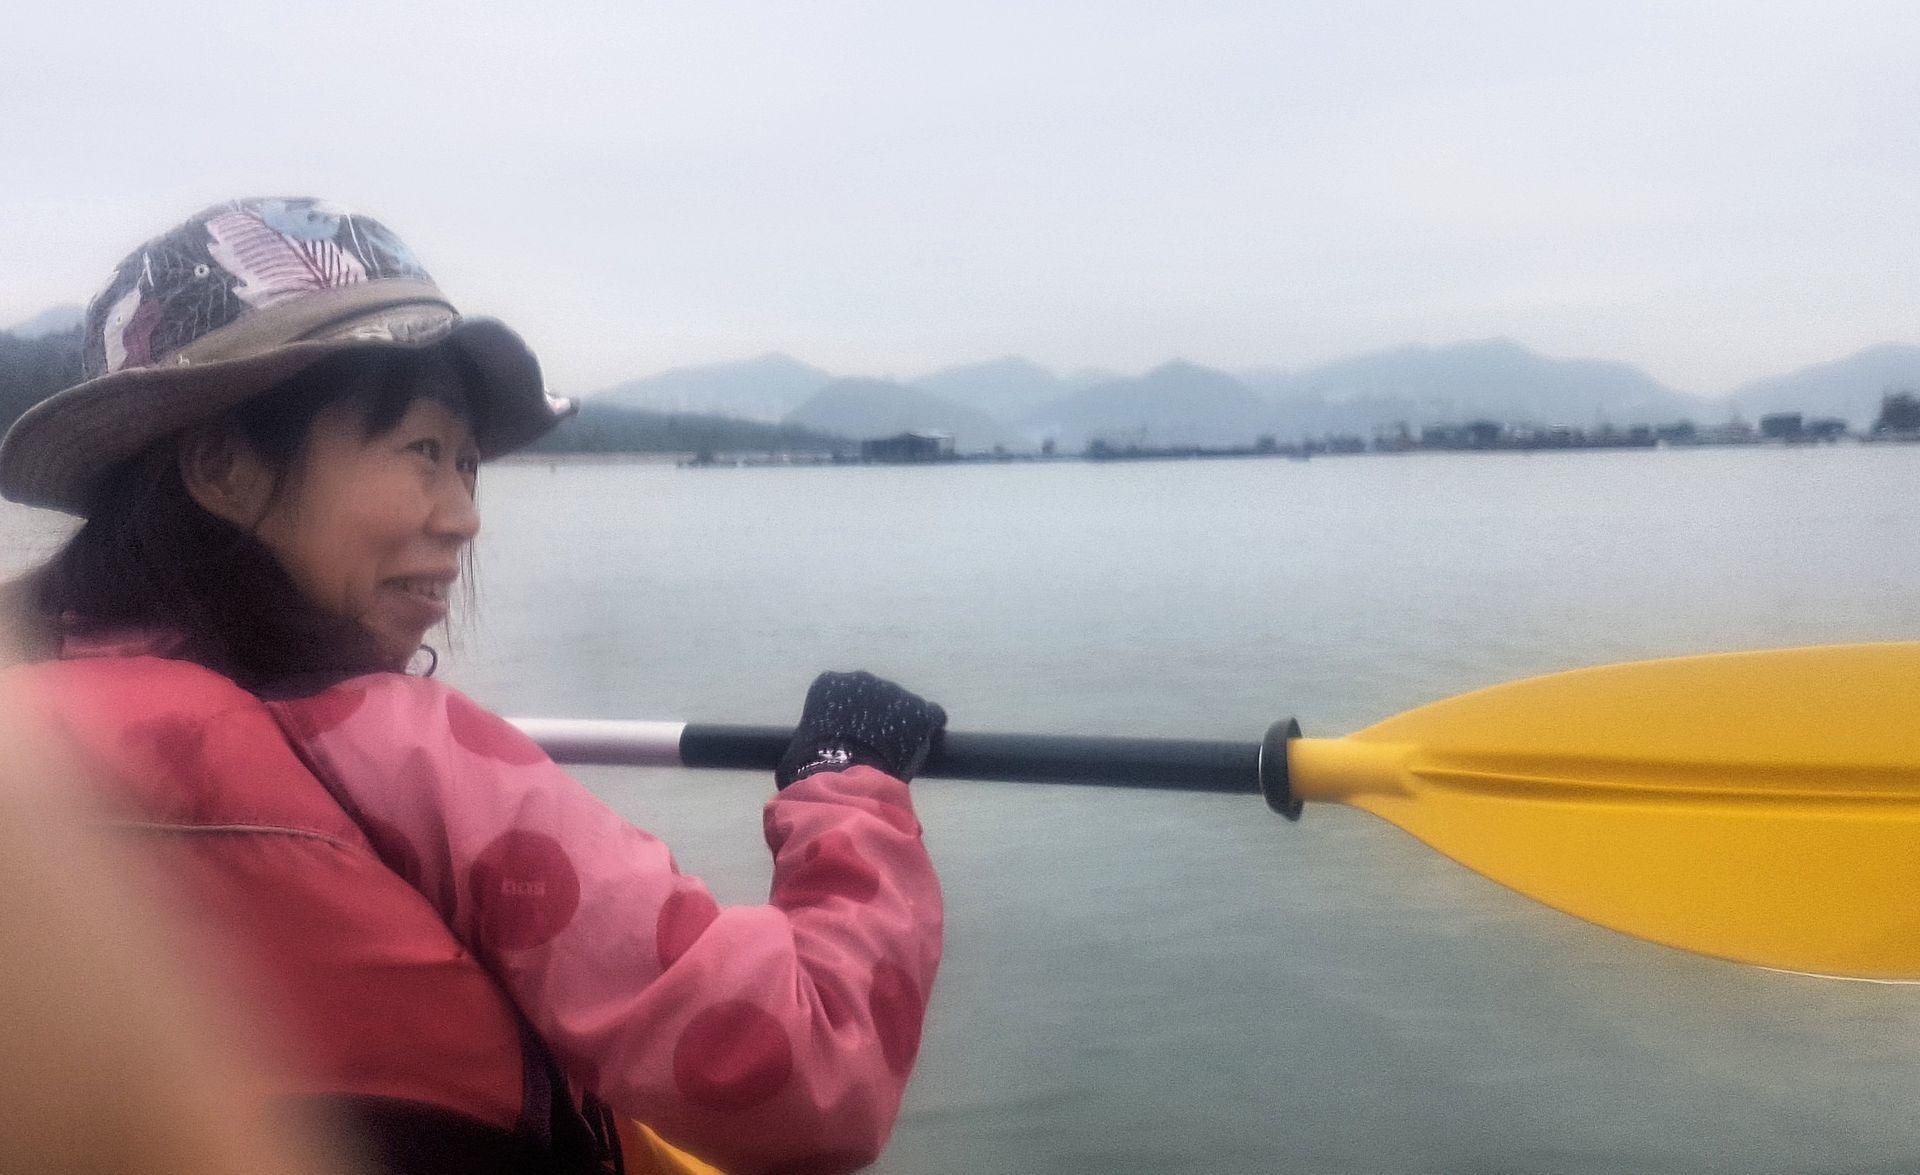 02 Jan 2019 Dog Island Sea Kayak Hong Kong